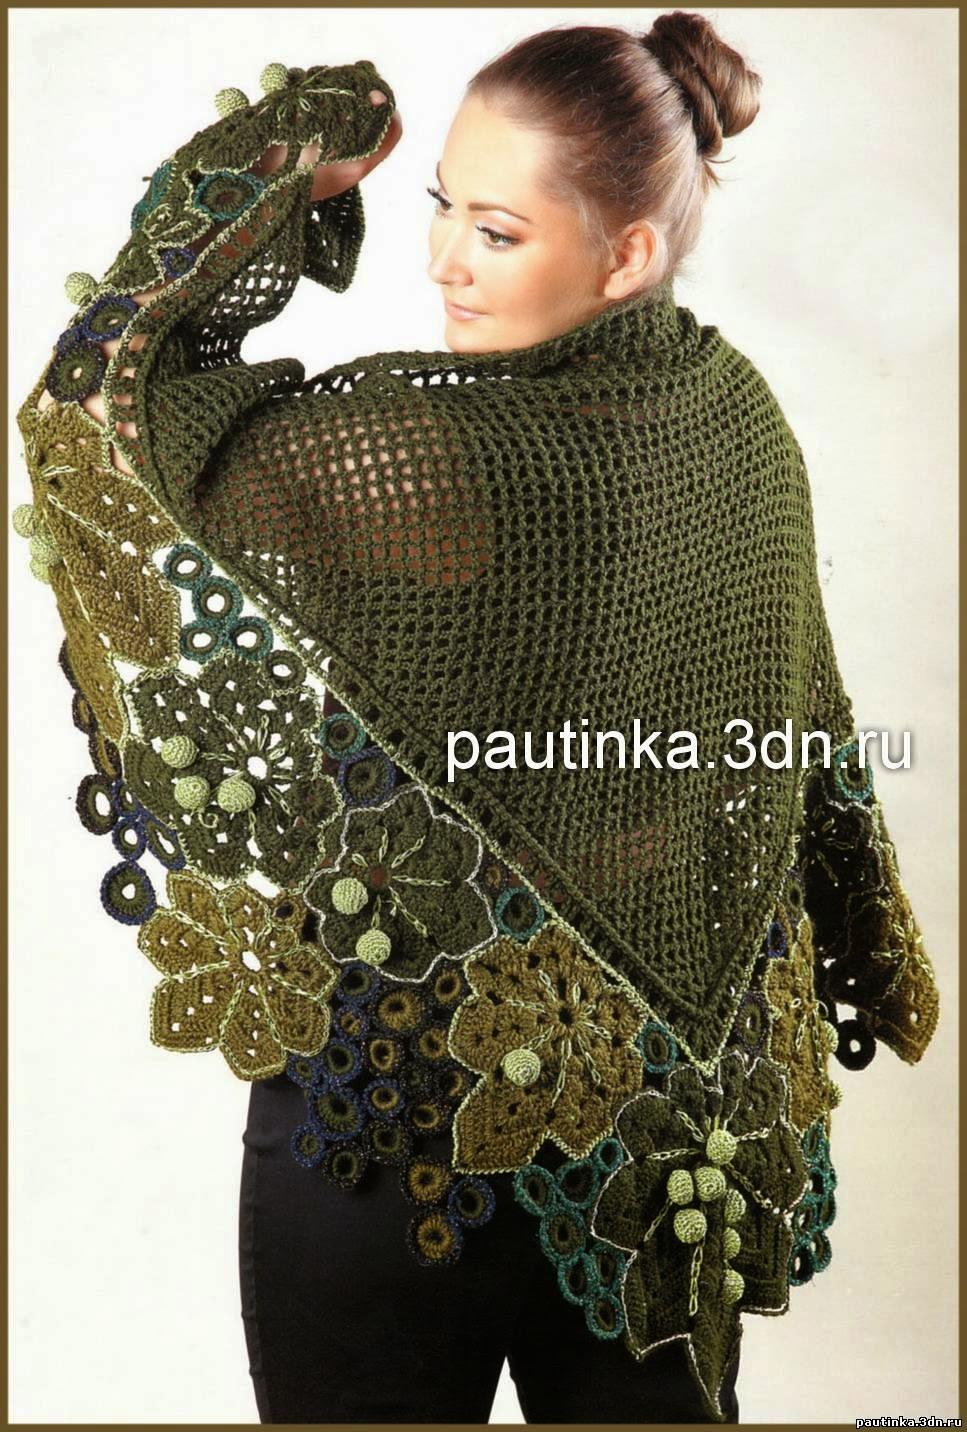 ergahandmade: Irish Crochet Lace Shawl + Diagrams